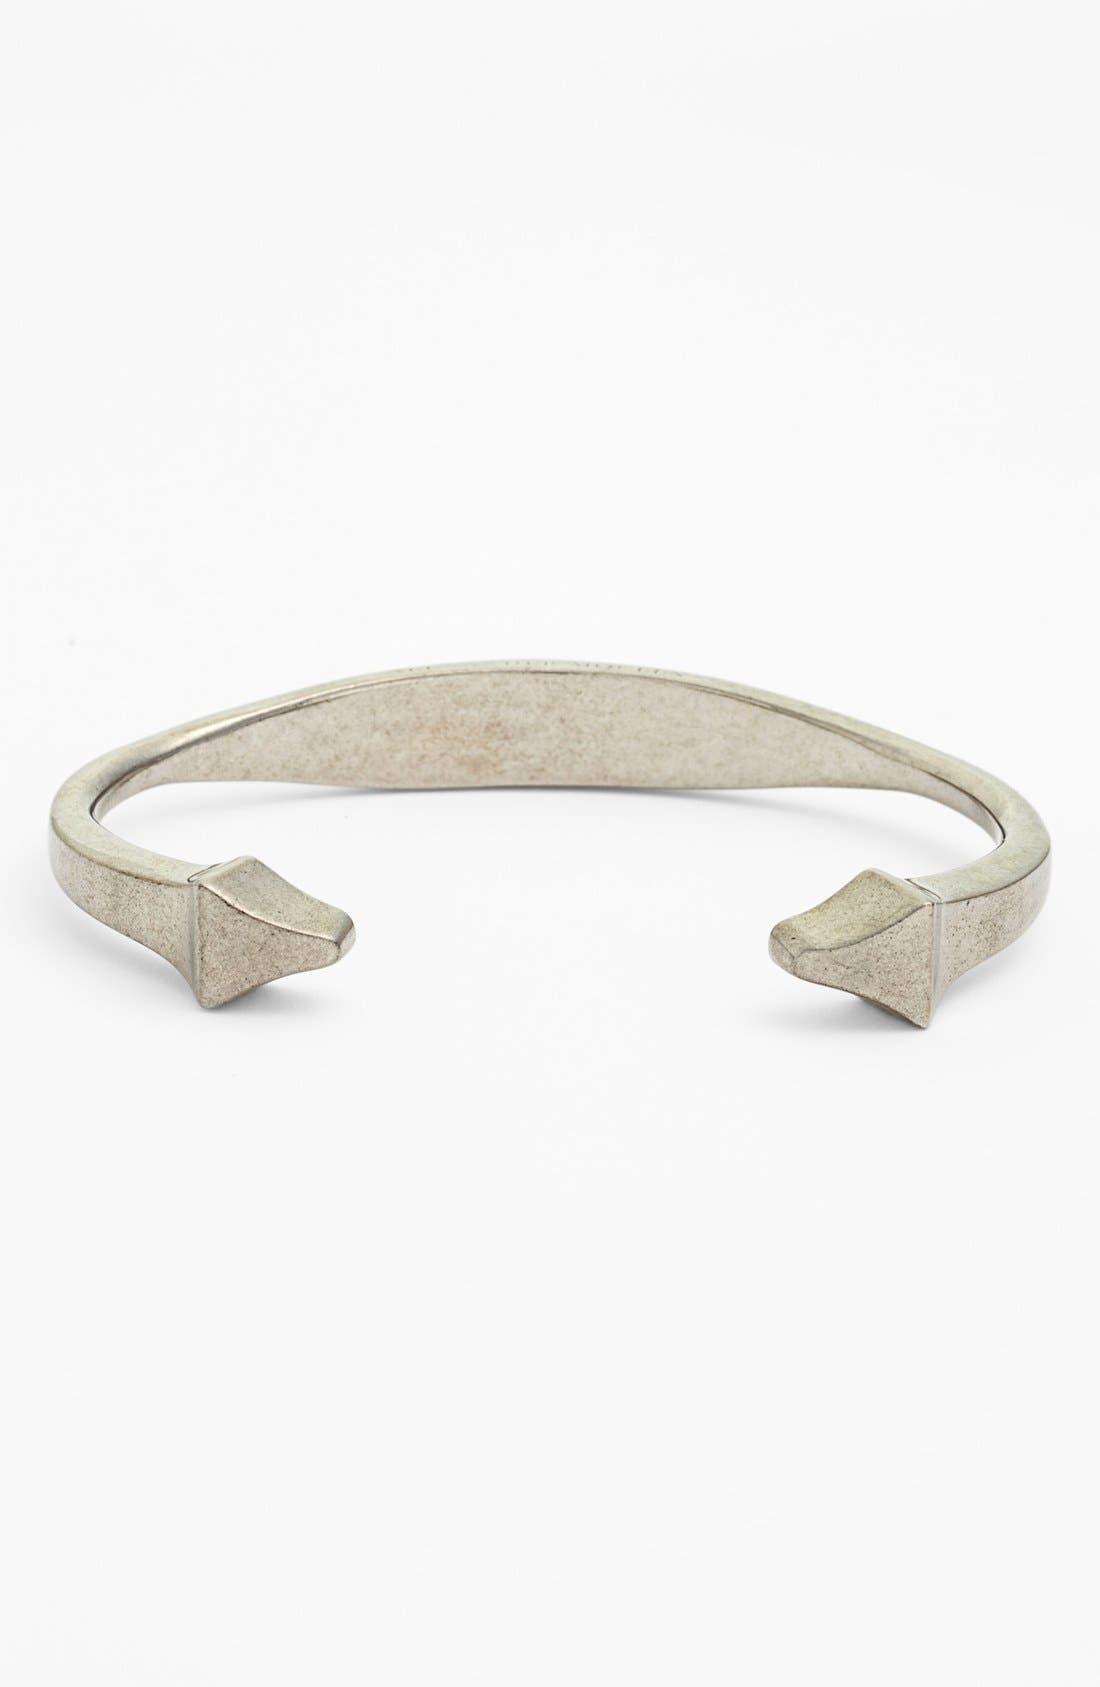 Alternate Image 1 Selected - Alexander McQueen Anatomical Brass Bracelet